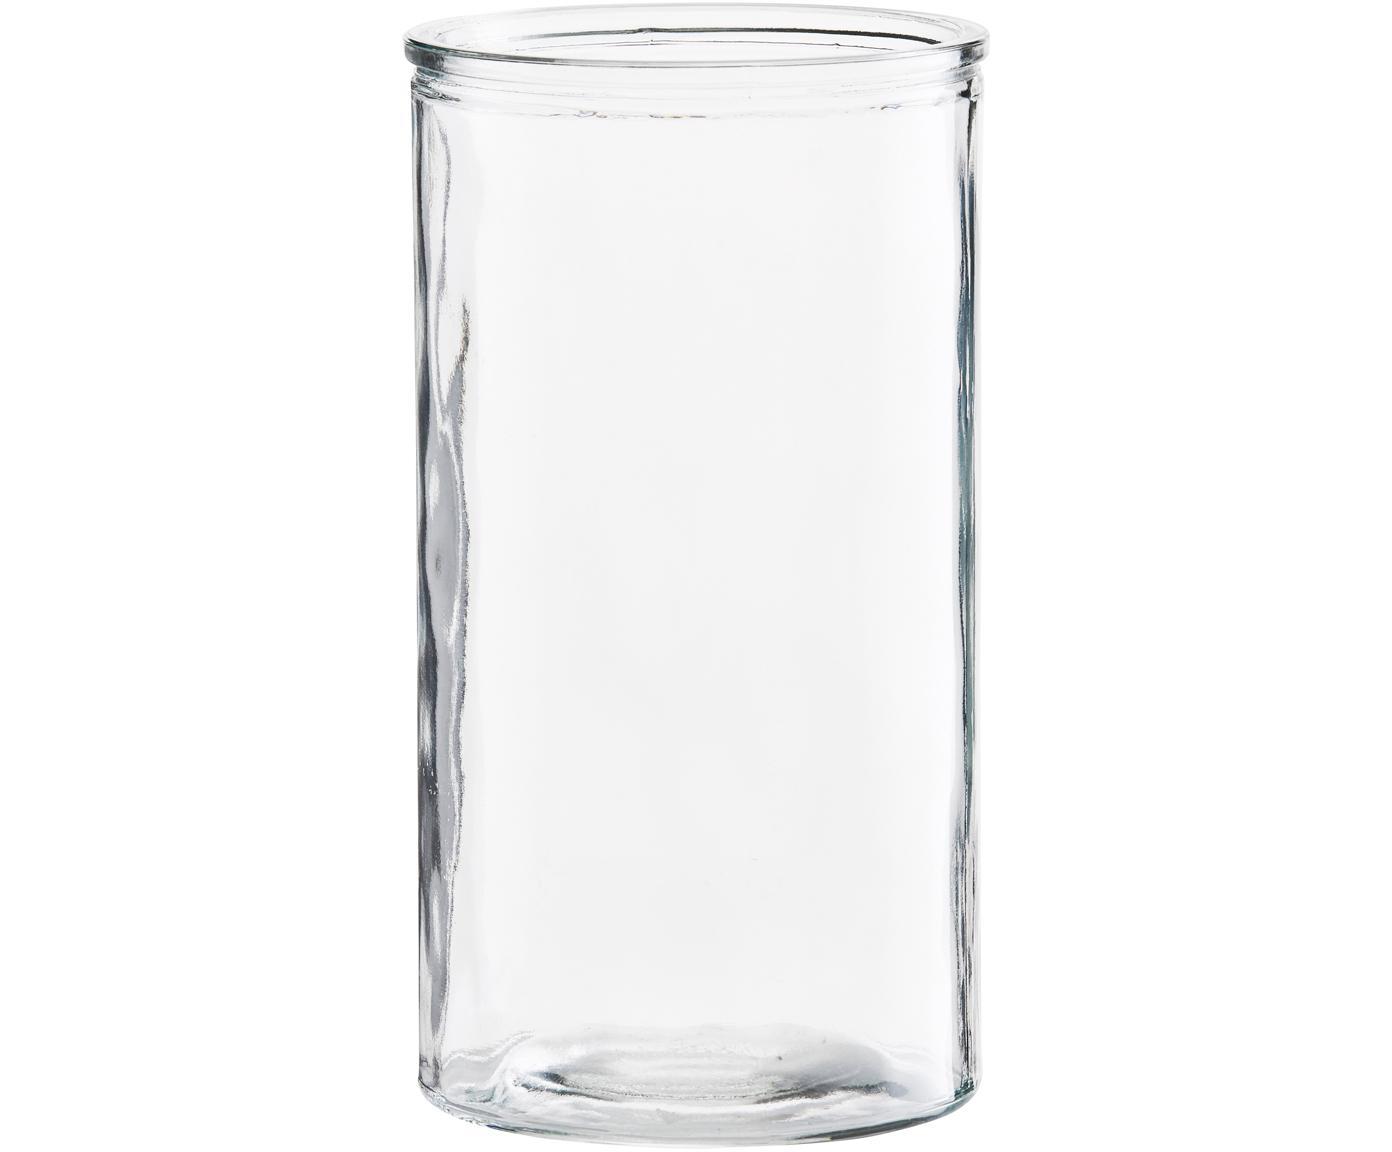 Jarrón de vidrio Cylinder, Vidrio, Transparente, Ø 13 x Al 24 cm